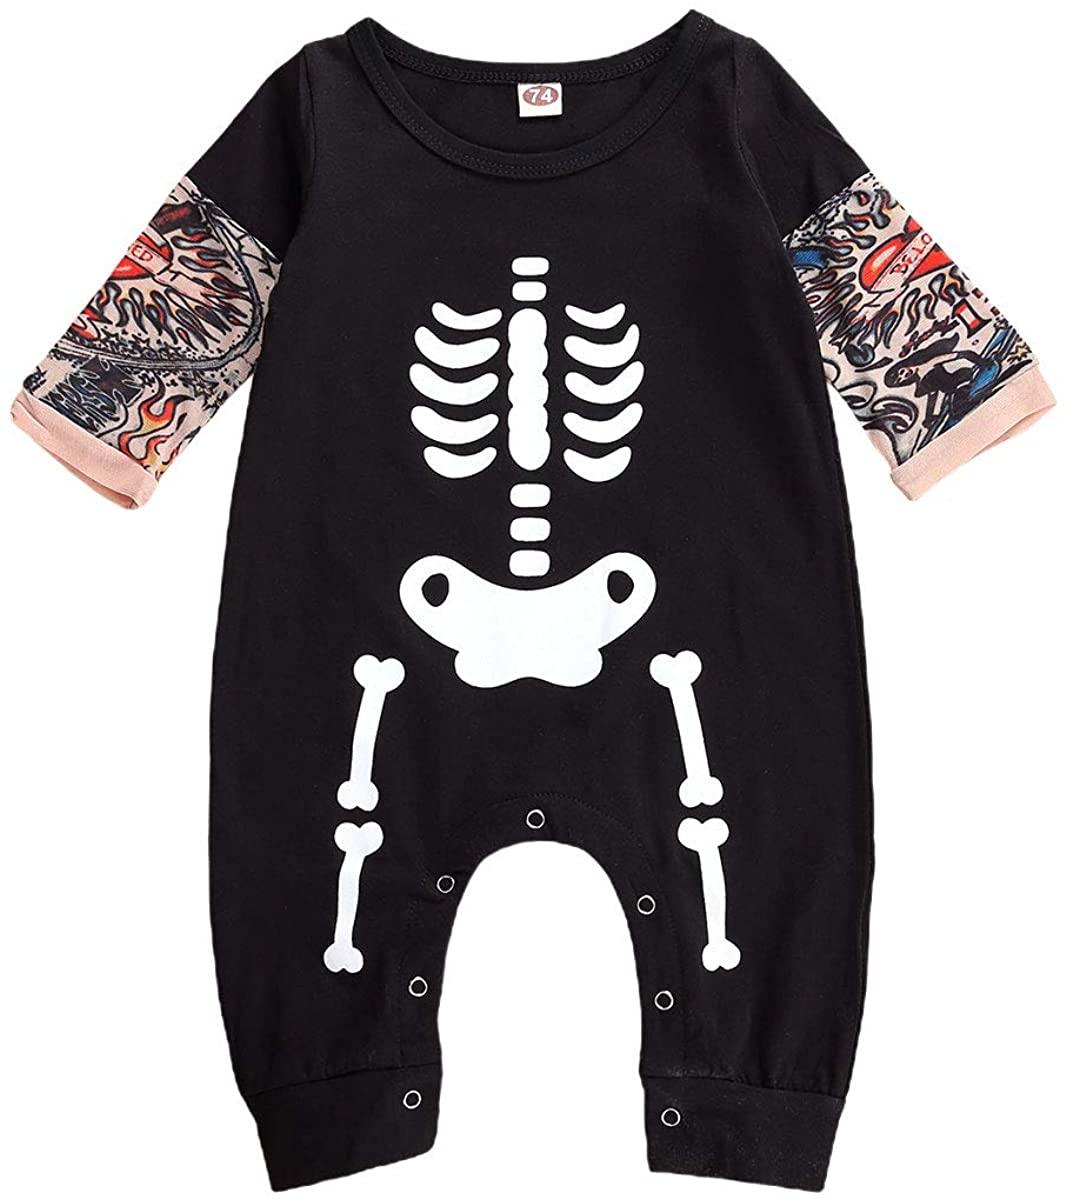 Newborn Baby Girls Boys Skull Floral Romper Jumpsuit Sleeveless Bodysuit Playsuit Headband Halloween Outfit